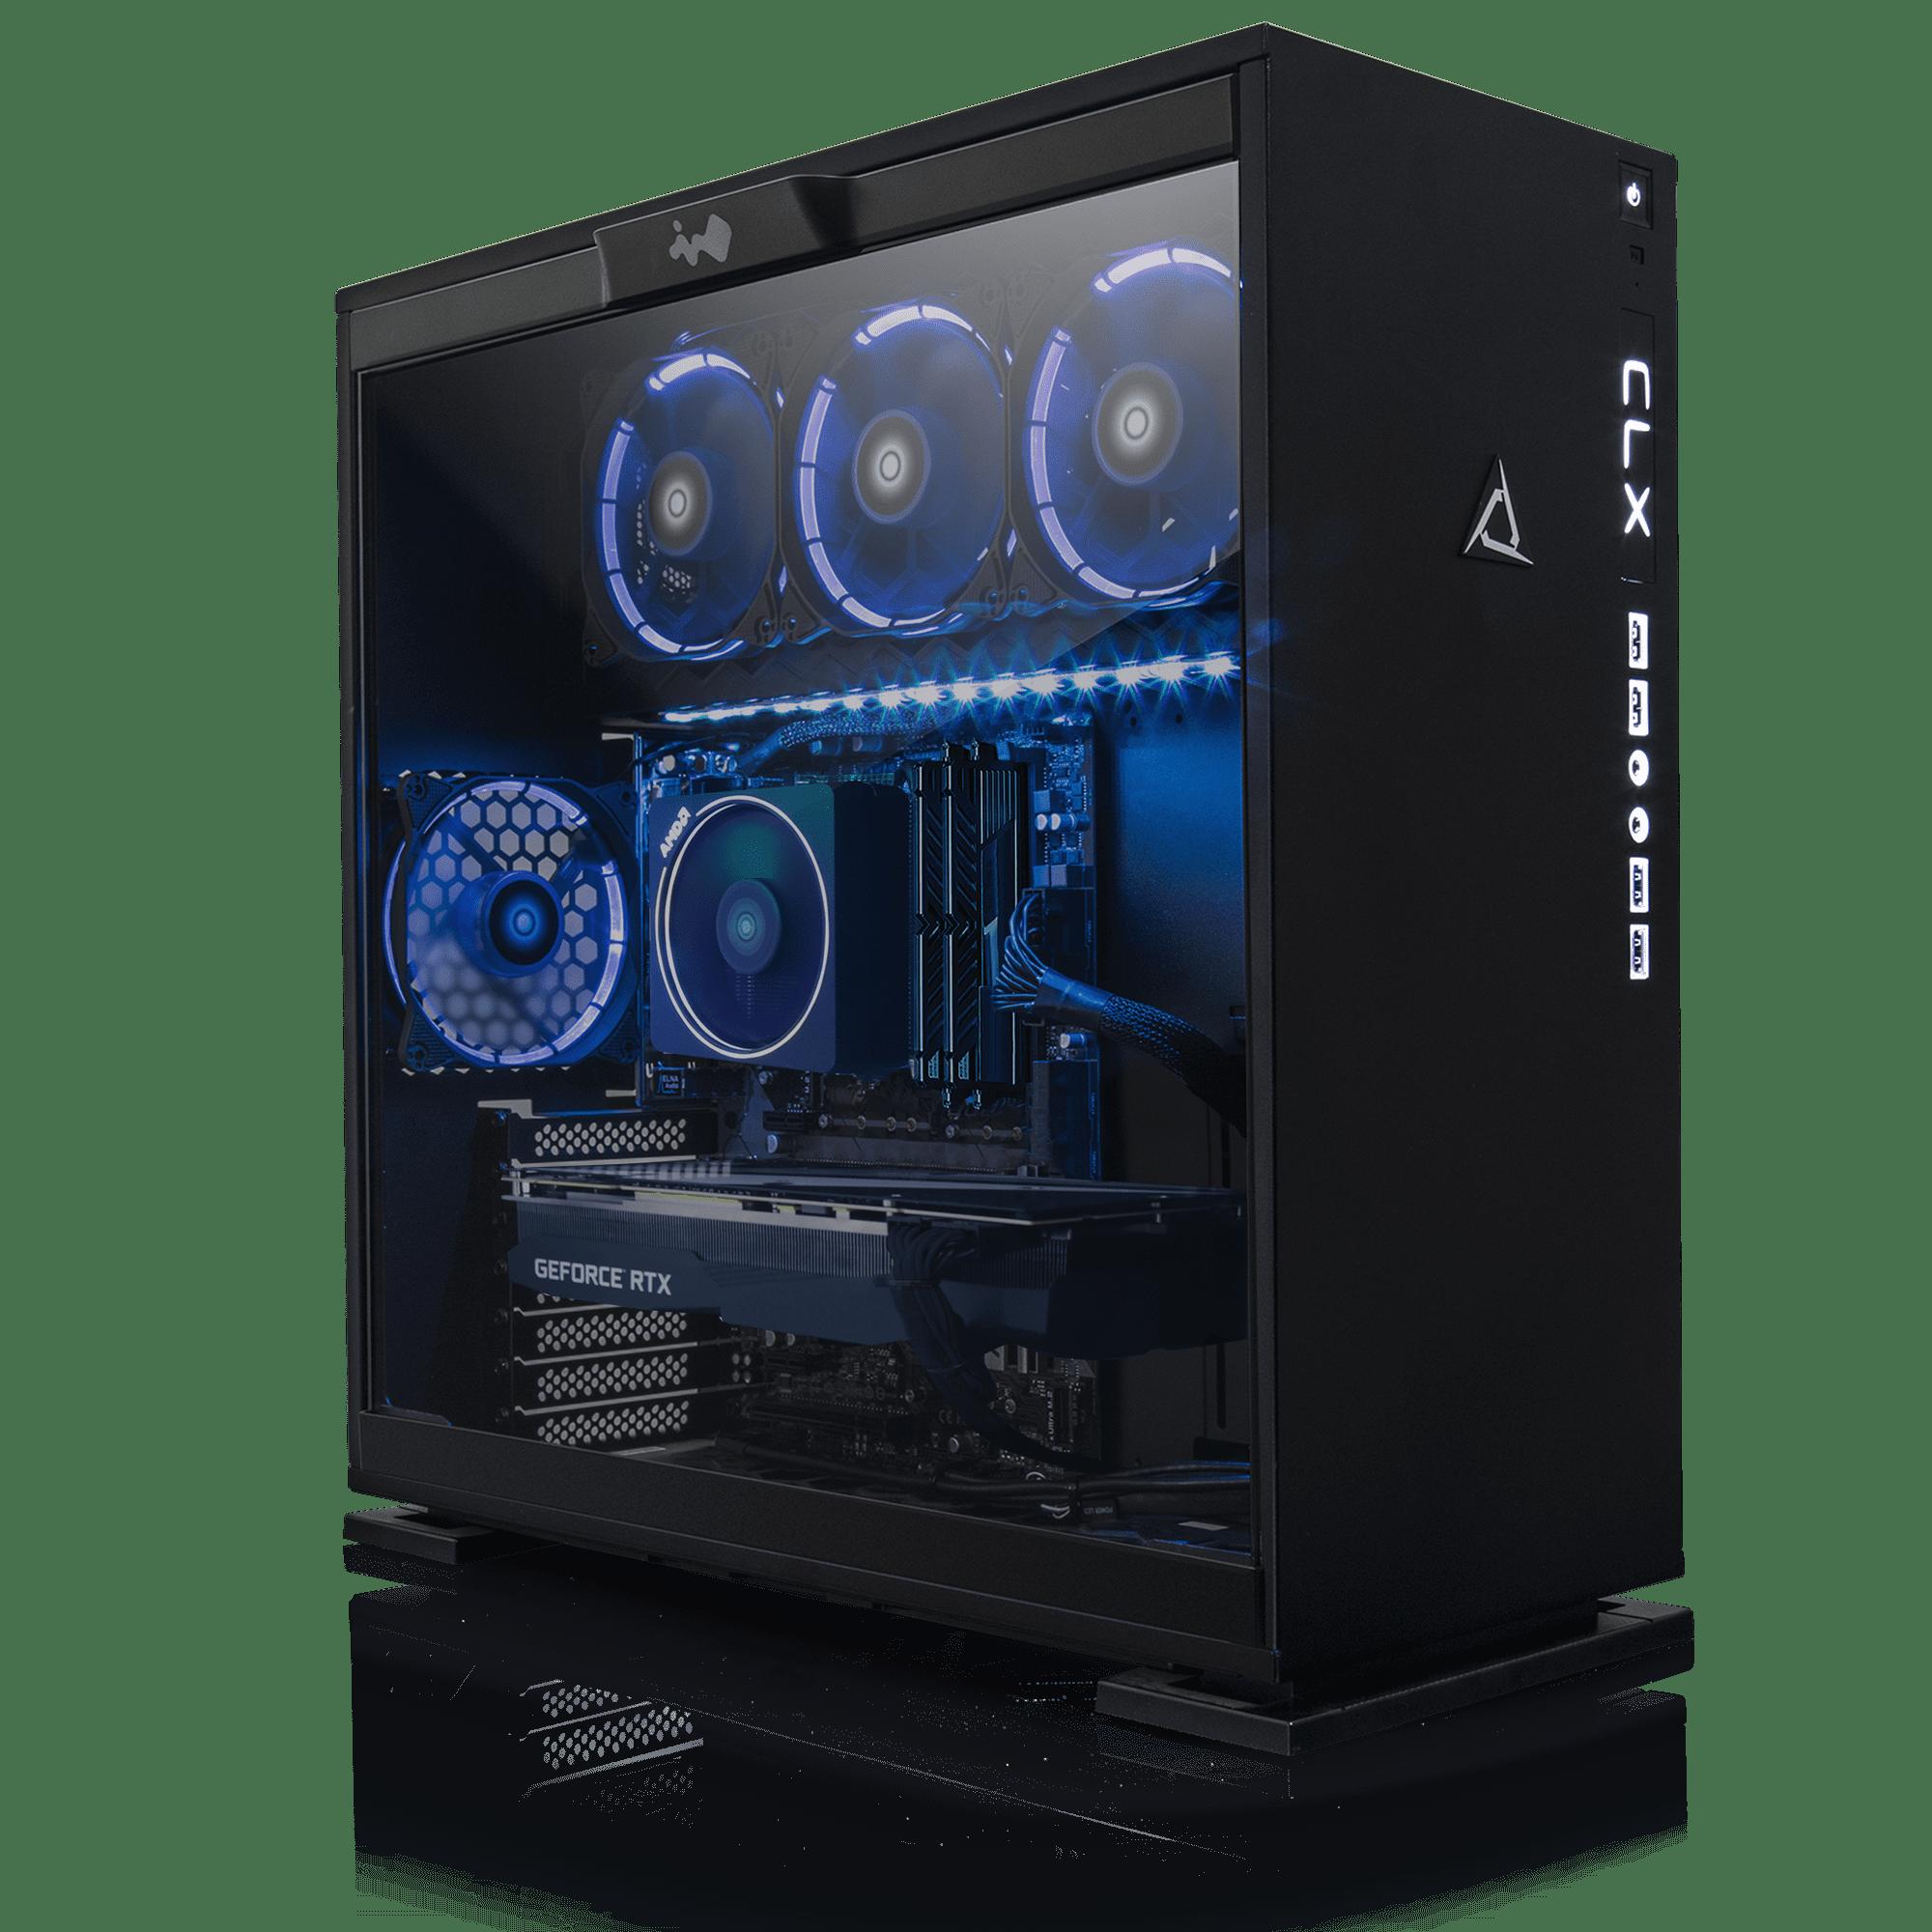 CLX SET GAMING PC AMD Ryzen 7 2700X 3.70GHz (8 Cores) 16GB DDR4 3TB HDD & 480GB SSD NVIDIA GeForce RTX 2080Ti 11GB GDDR6 MS Windows 10 Home 64-Bit